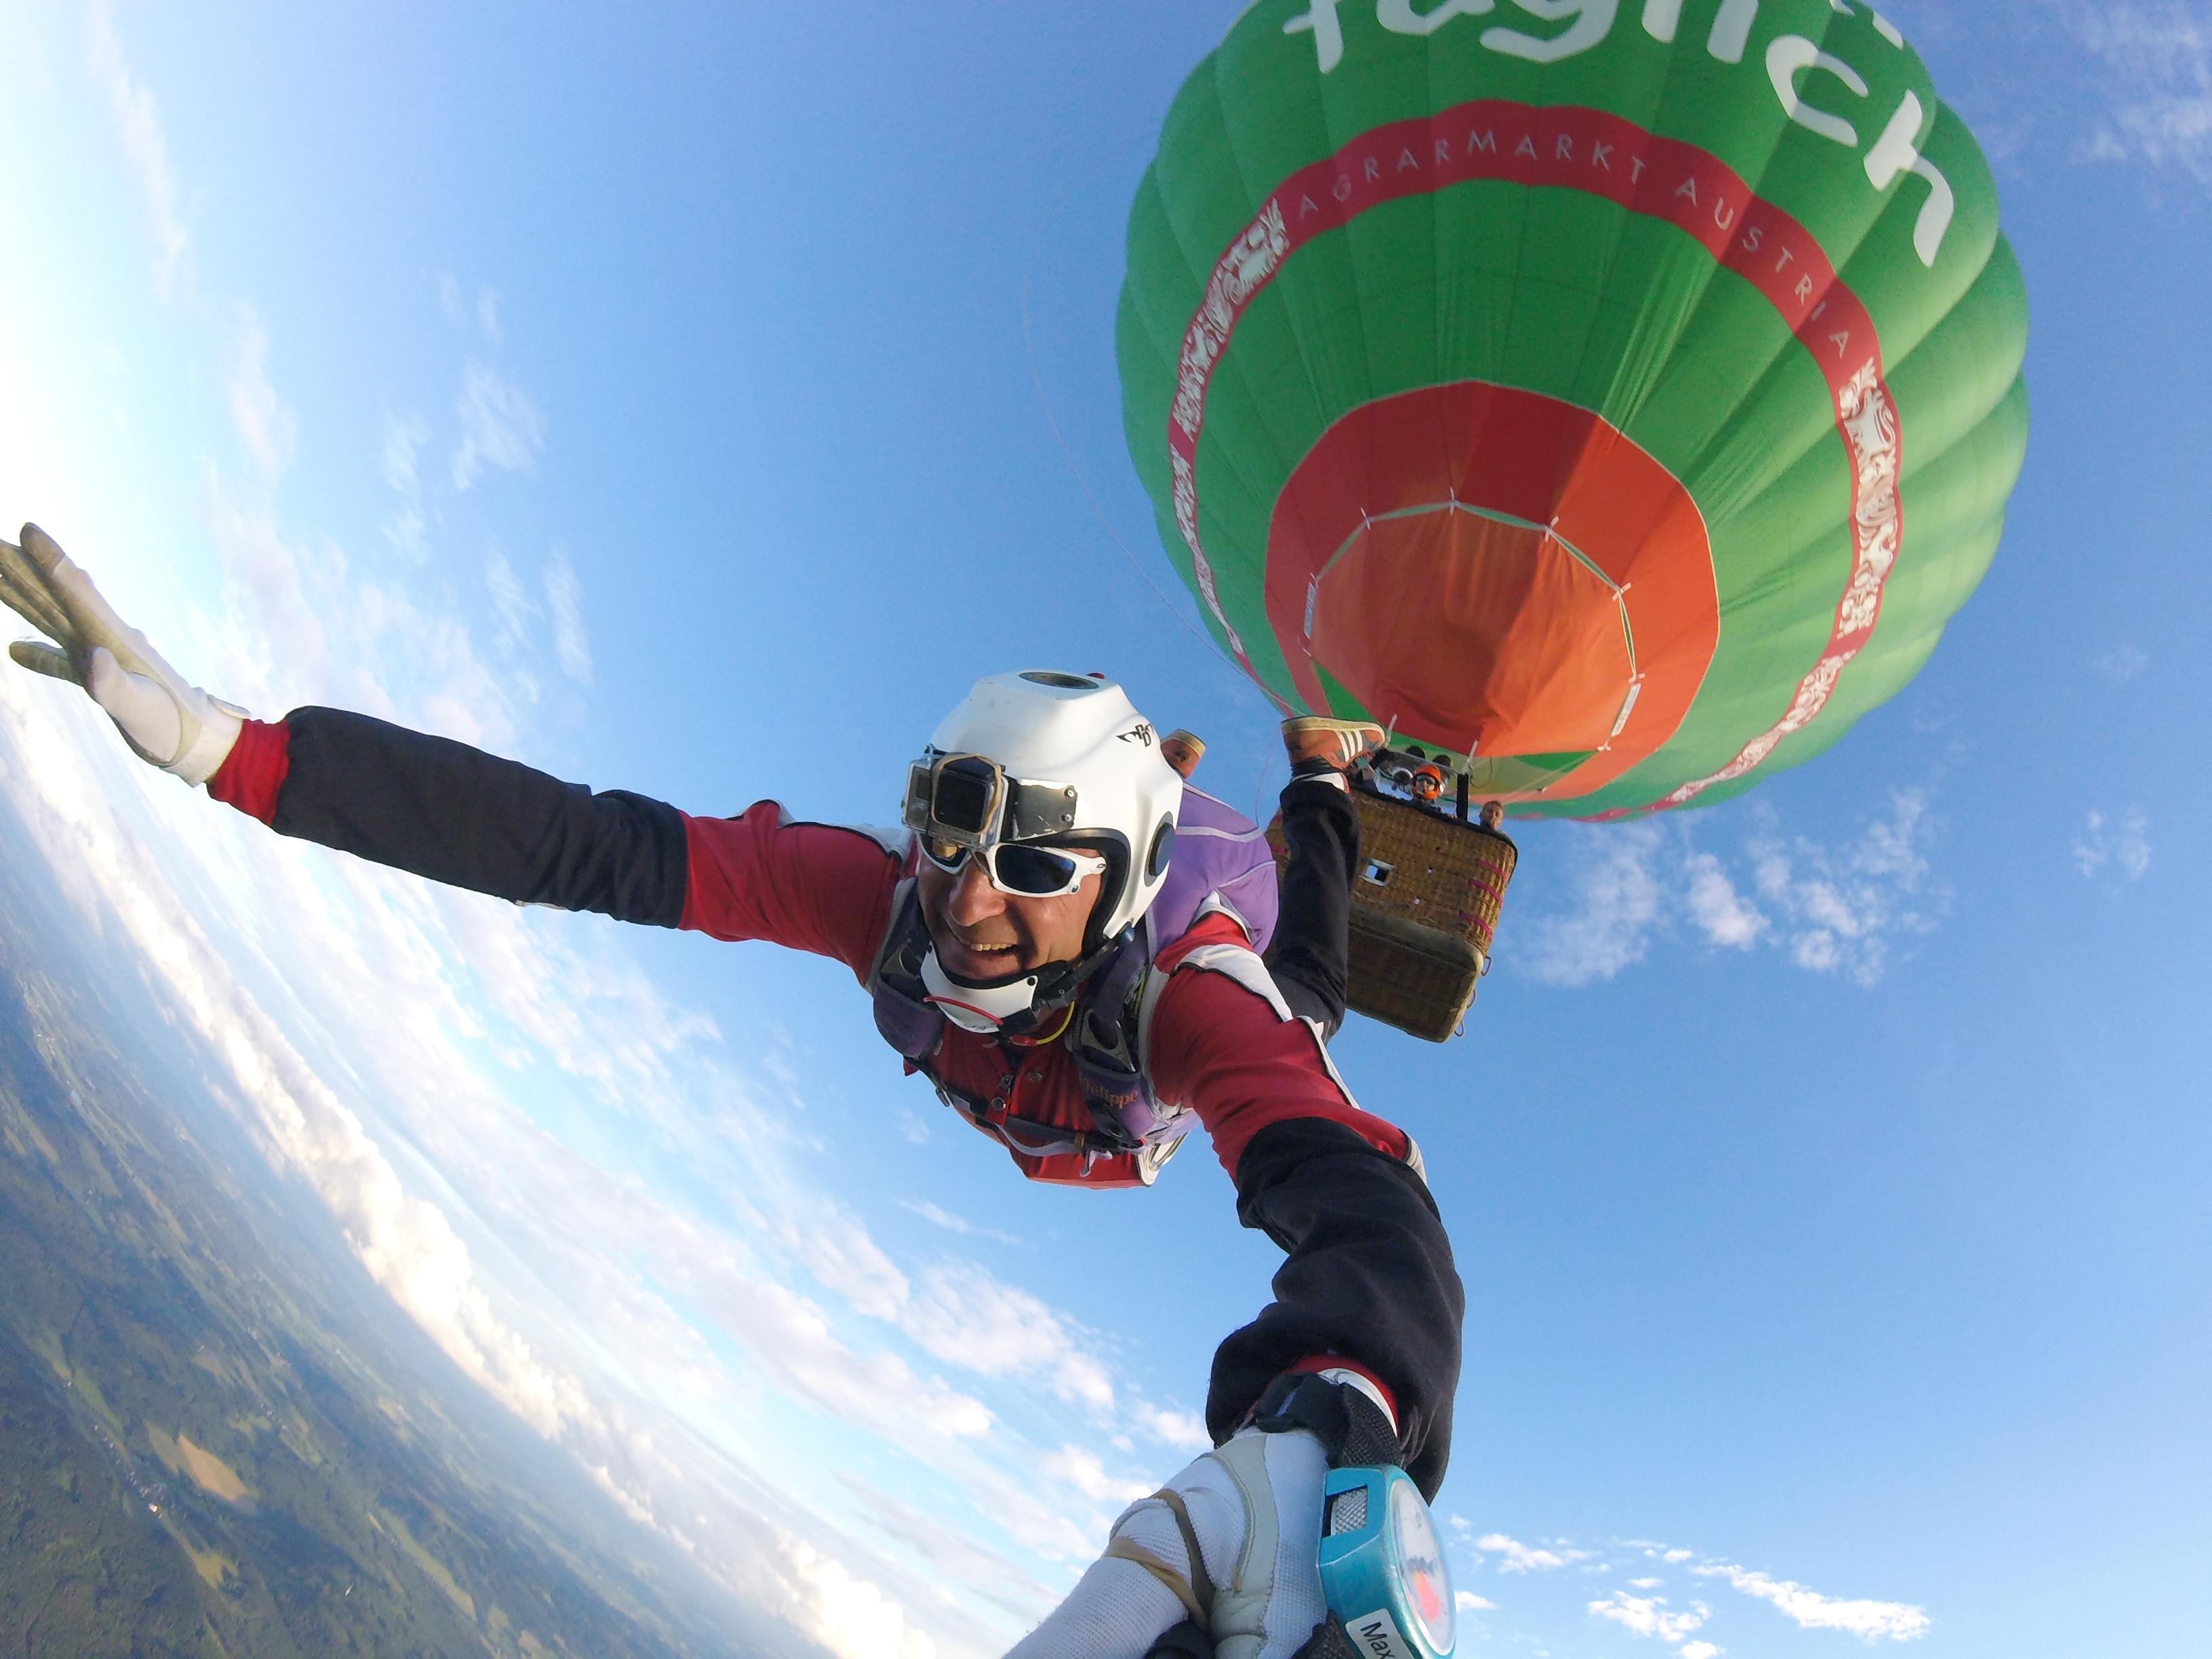 saut en parachute joigny